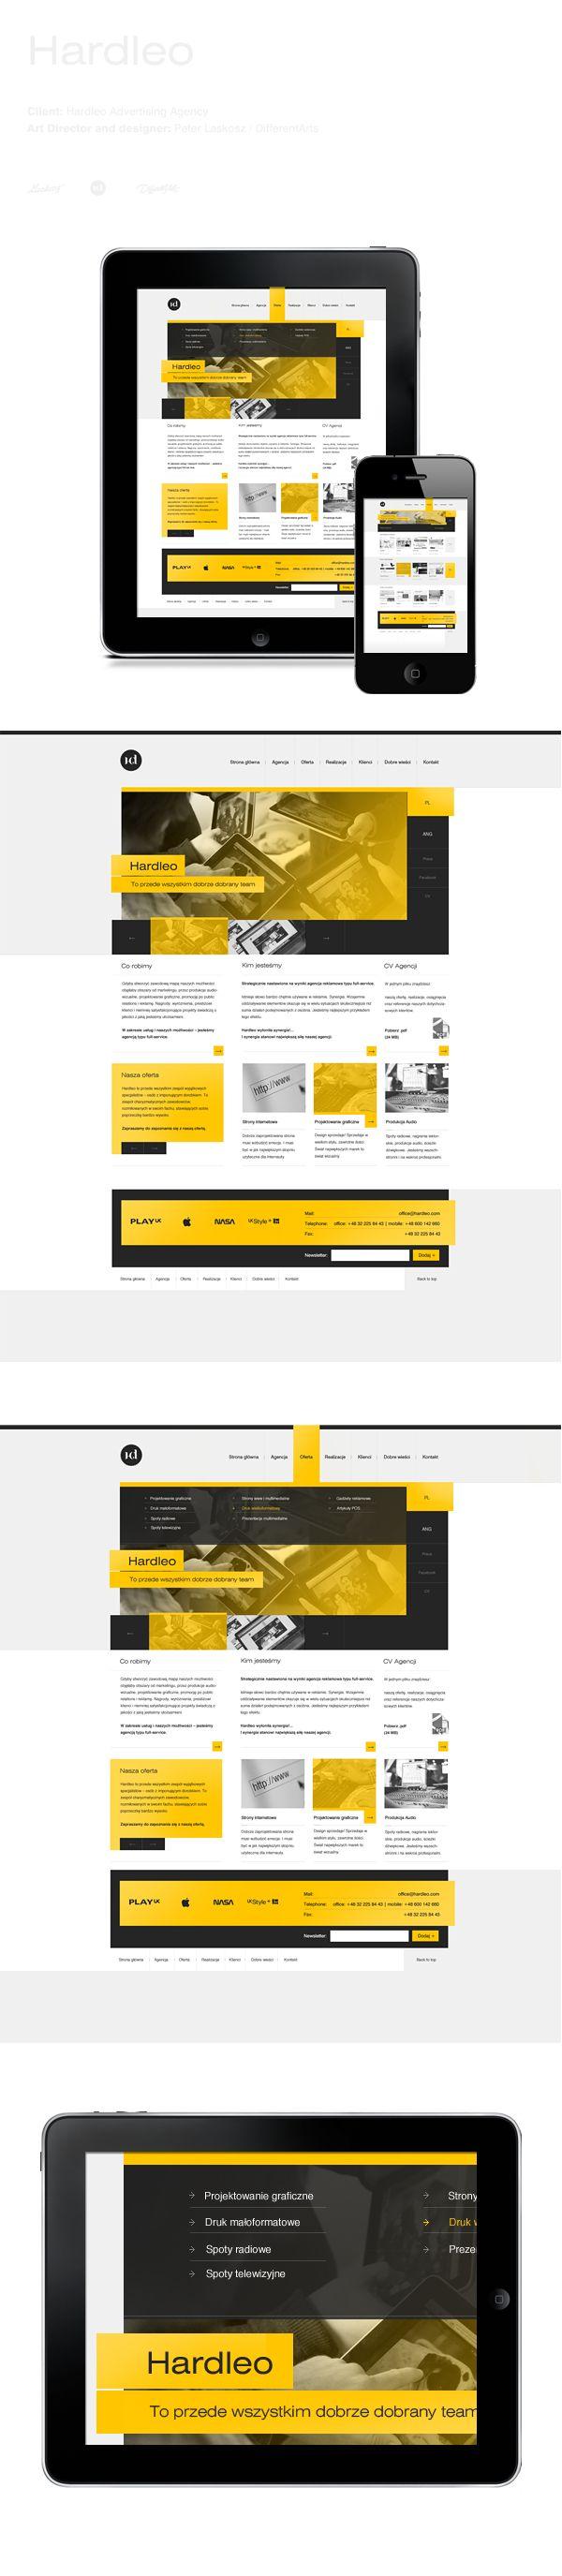 Hardleo on Web Design Served